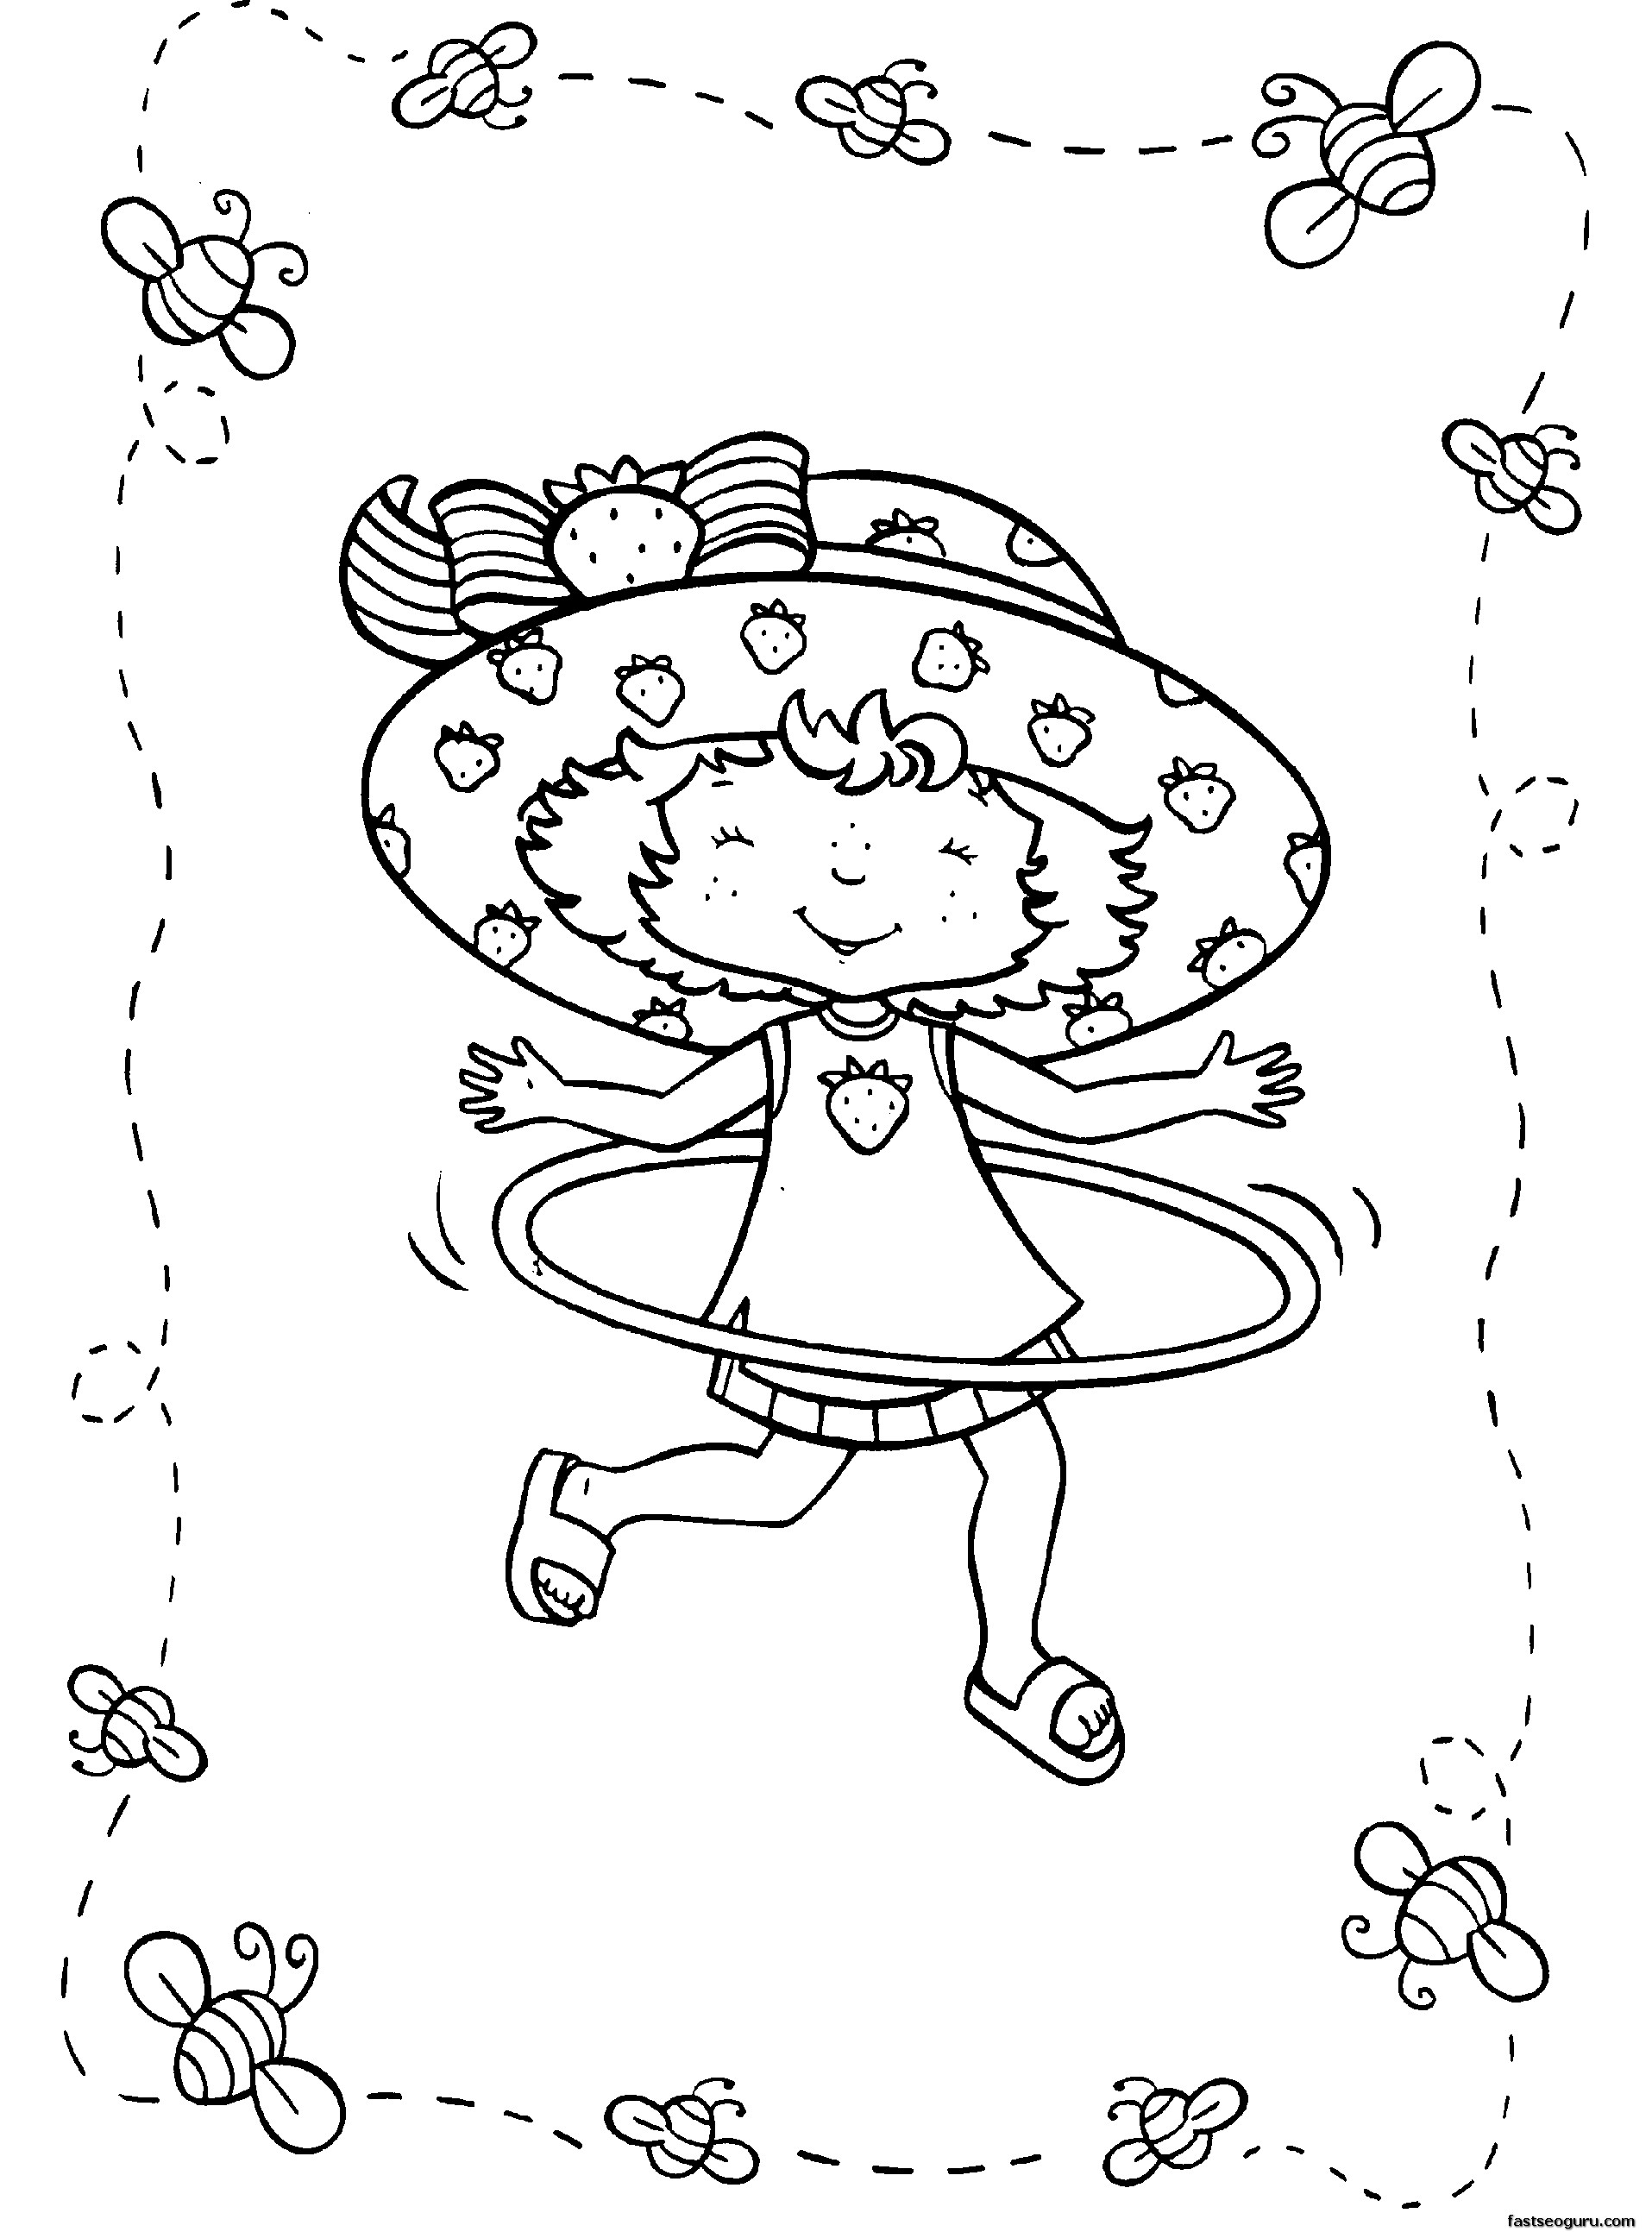 Printable cartoon Strawberry Shortcake